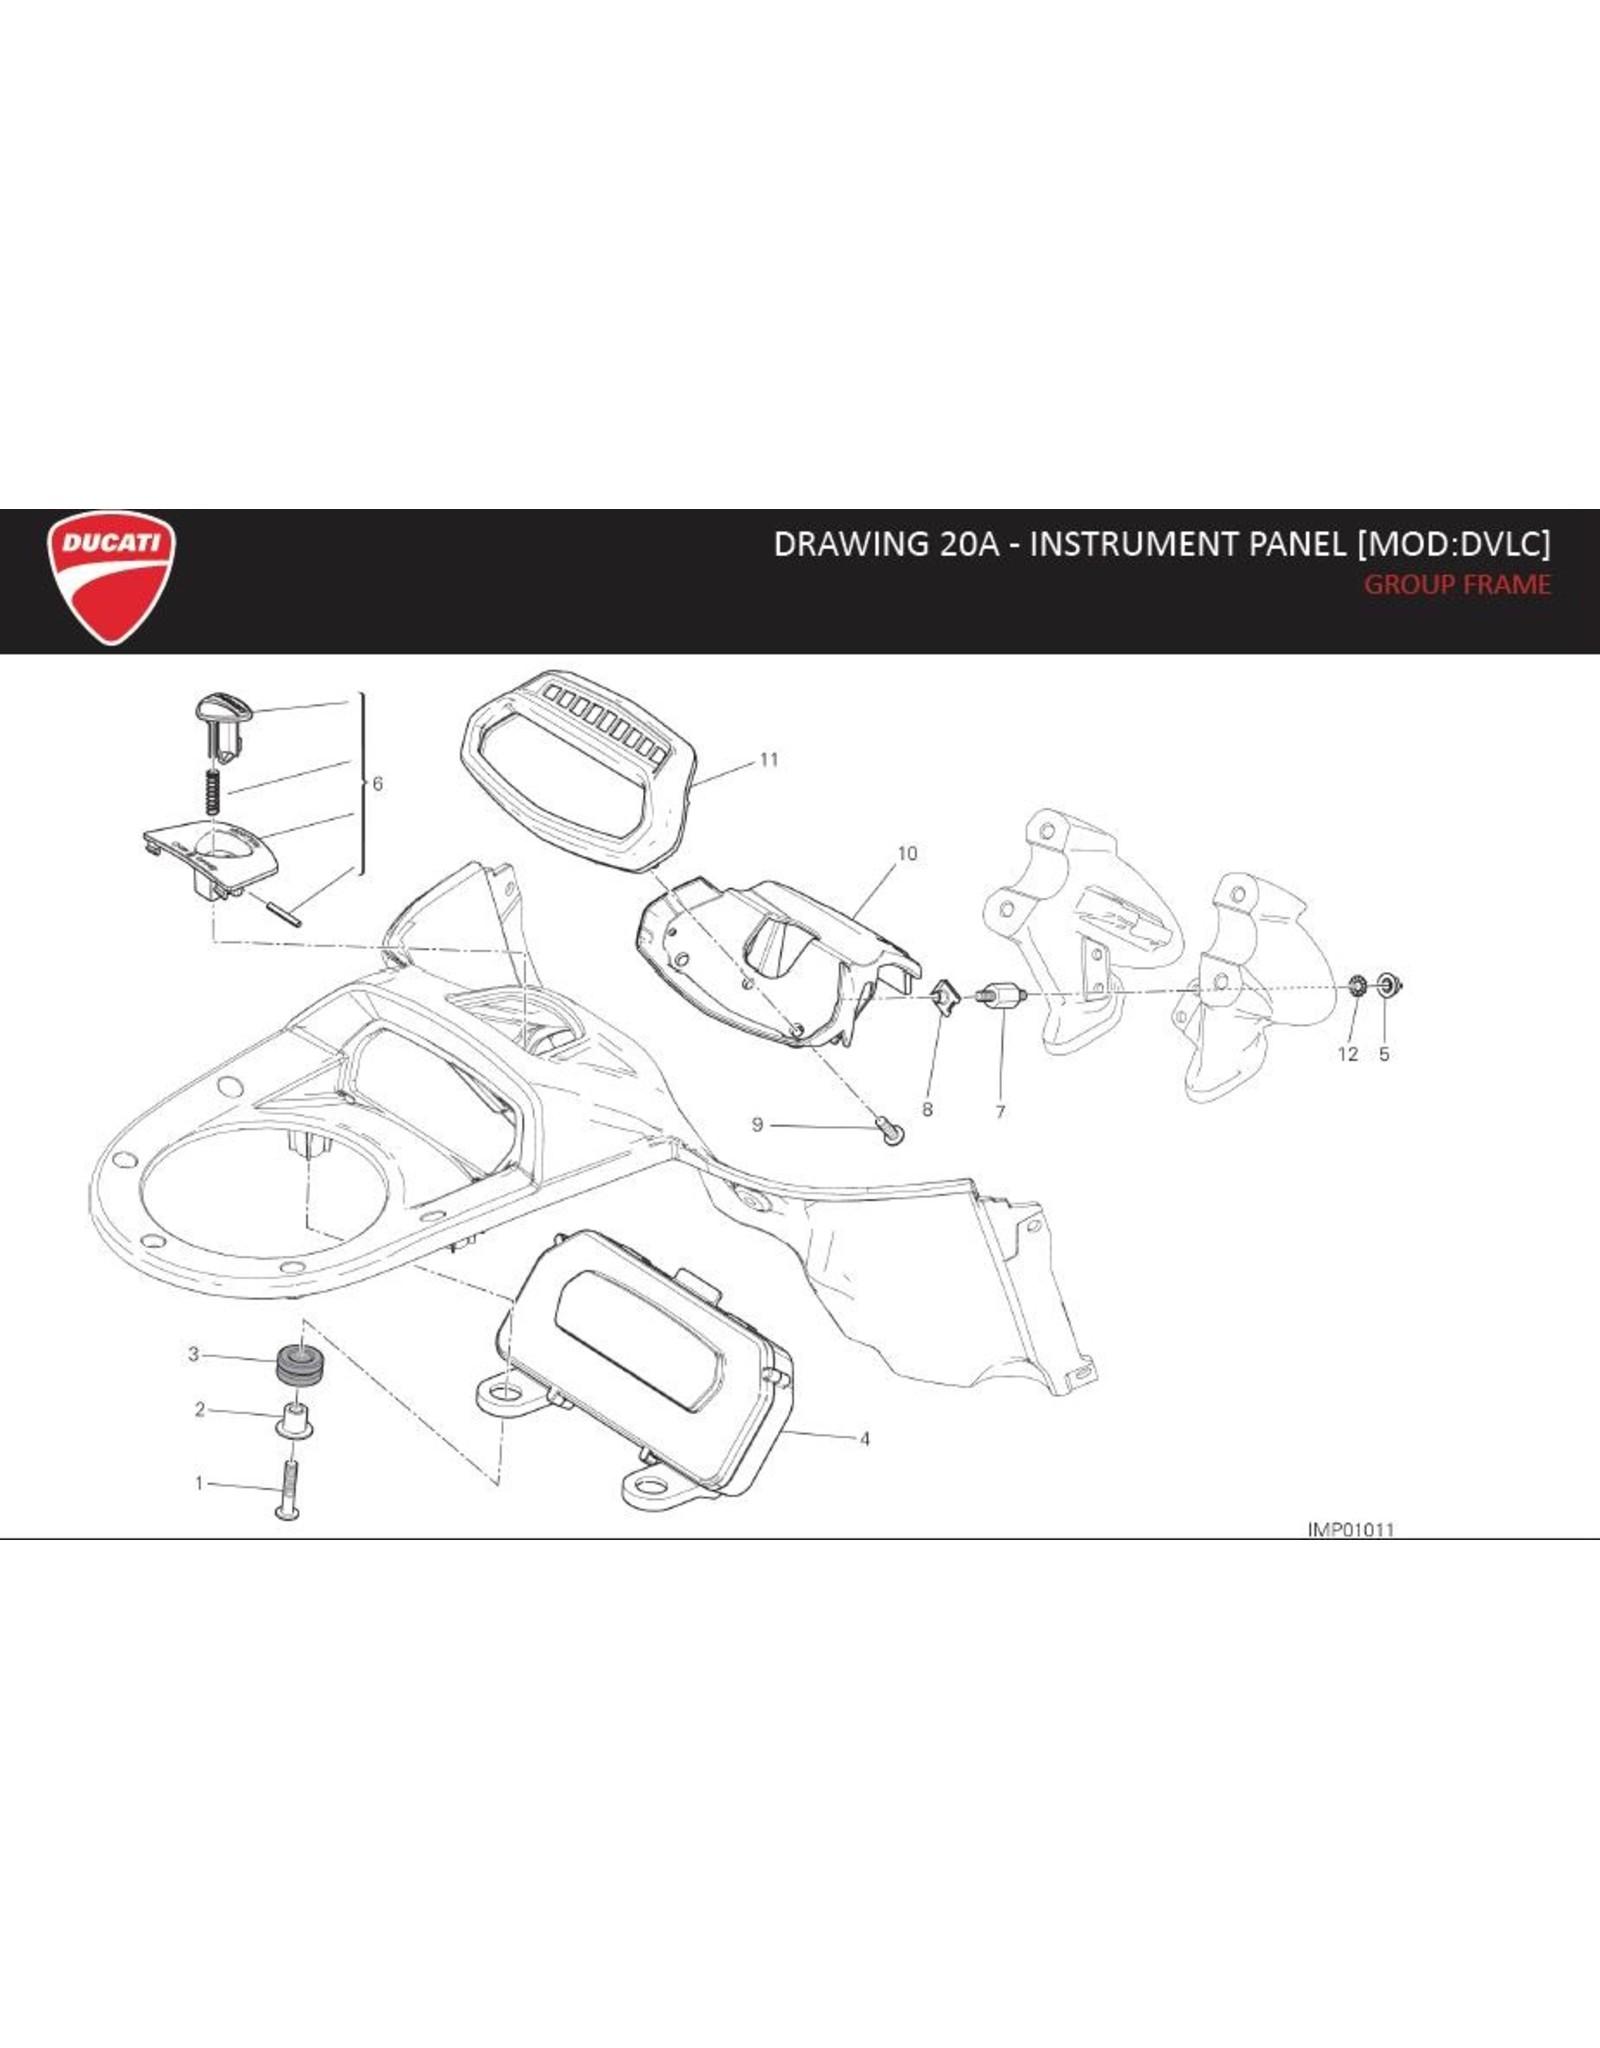 Ducati DUCATI INSTRUMENT PANEL TANK 40611093E